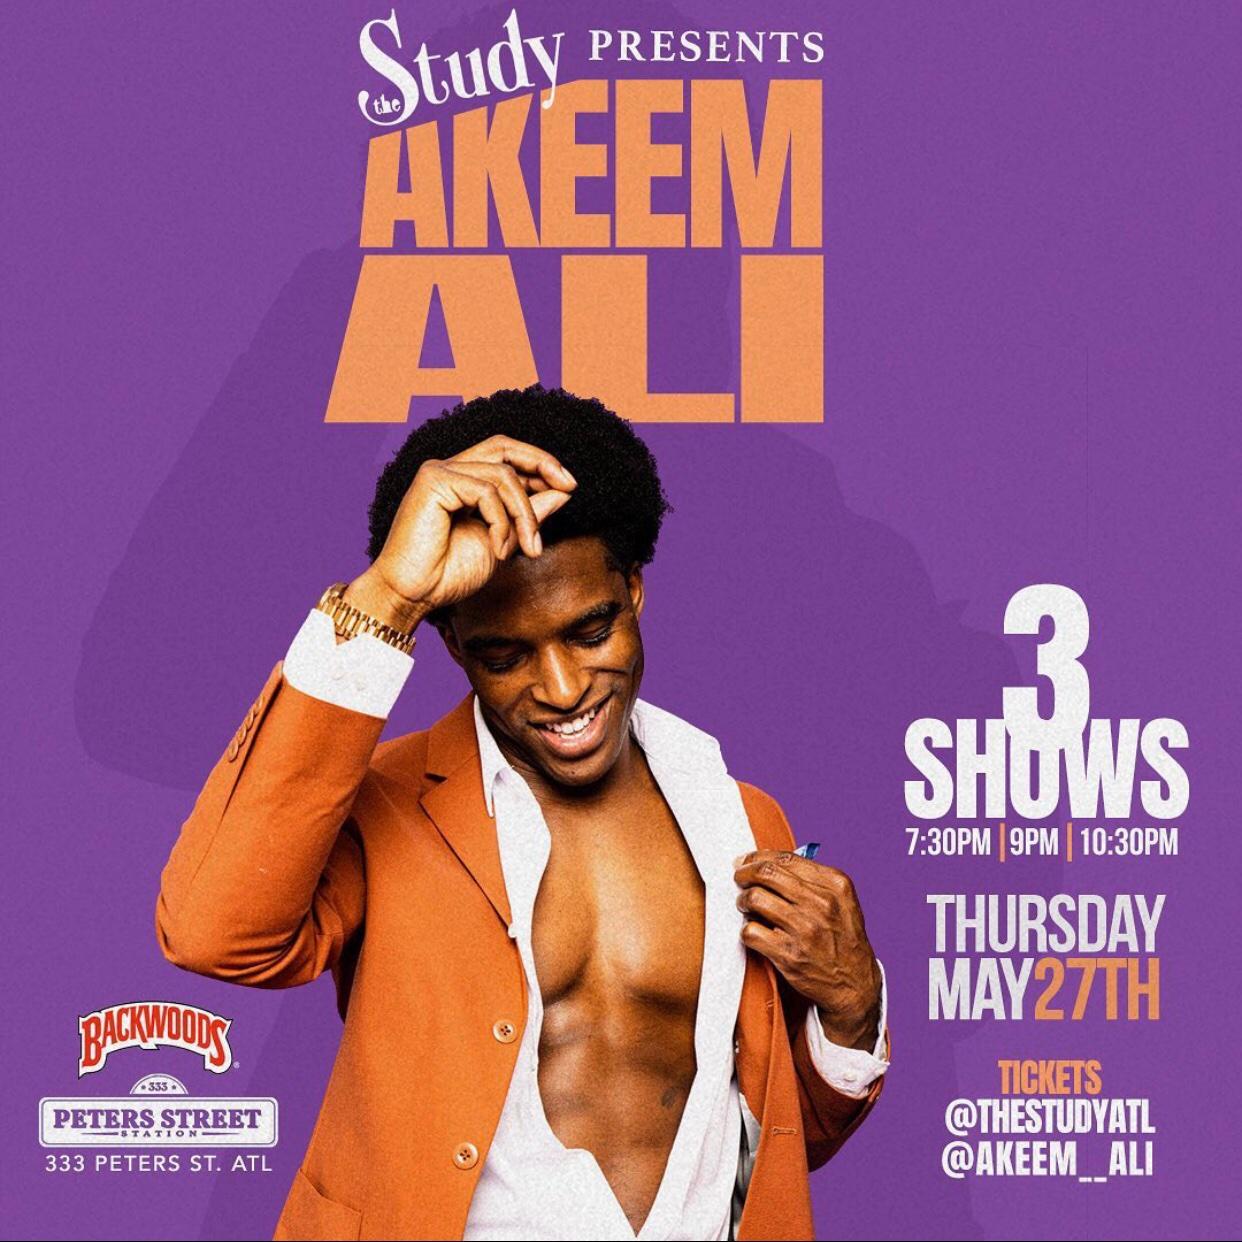 Street Execs Presents: The Study w/ Akeem Ali cover